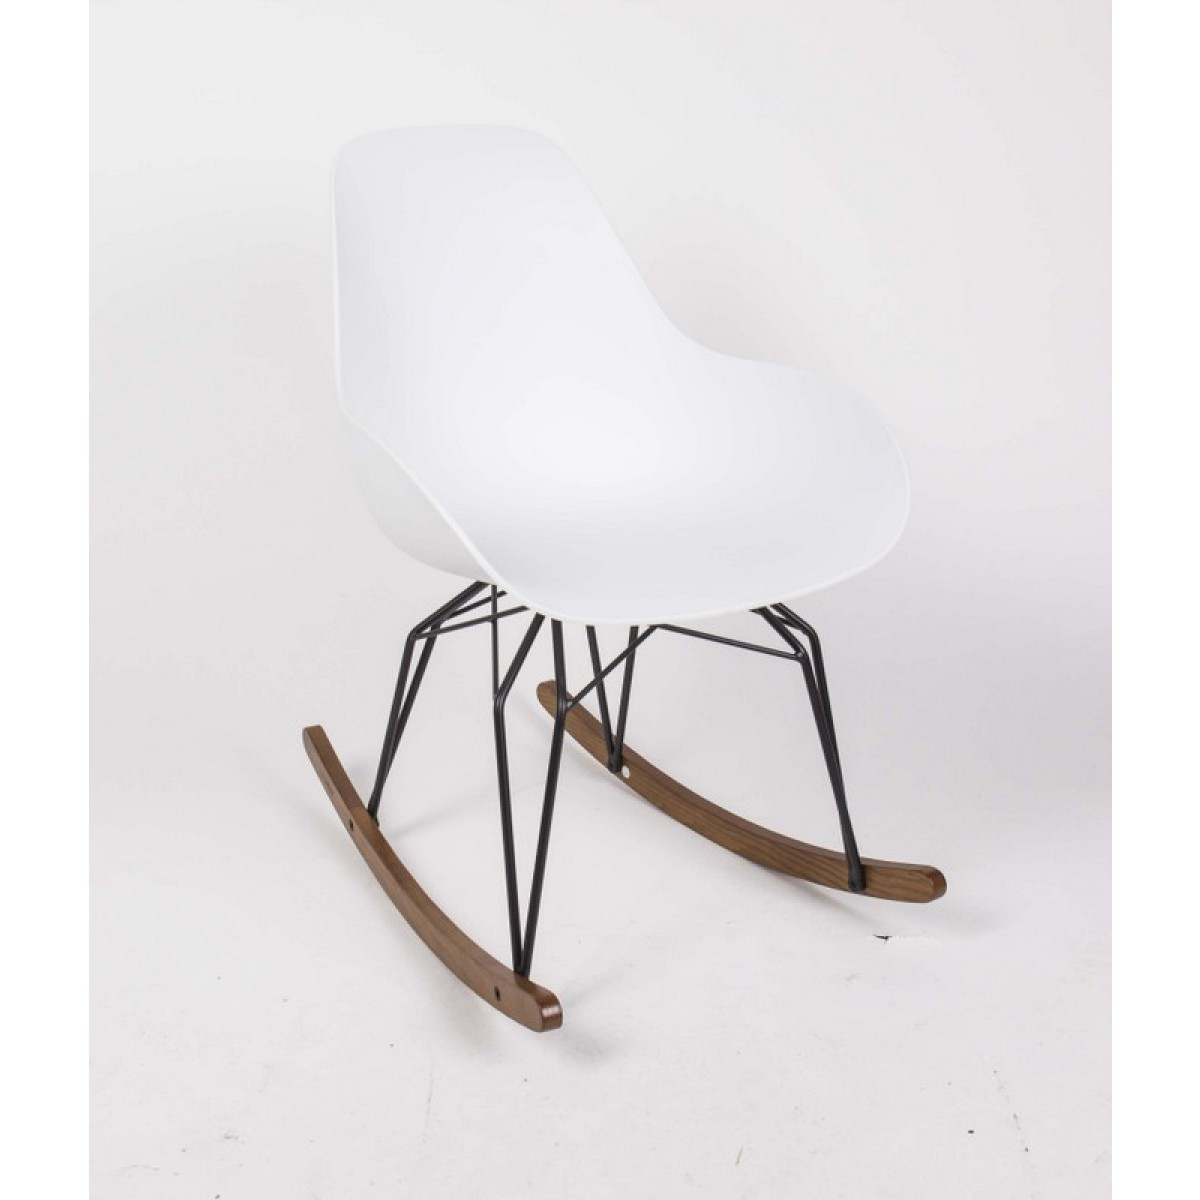 Design schaukelstuhl sessel mit armlehne sitzh he 42 cm - Designer schaukelstuhl ...